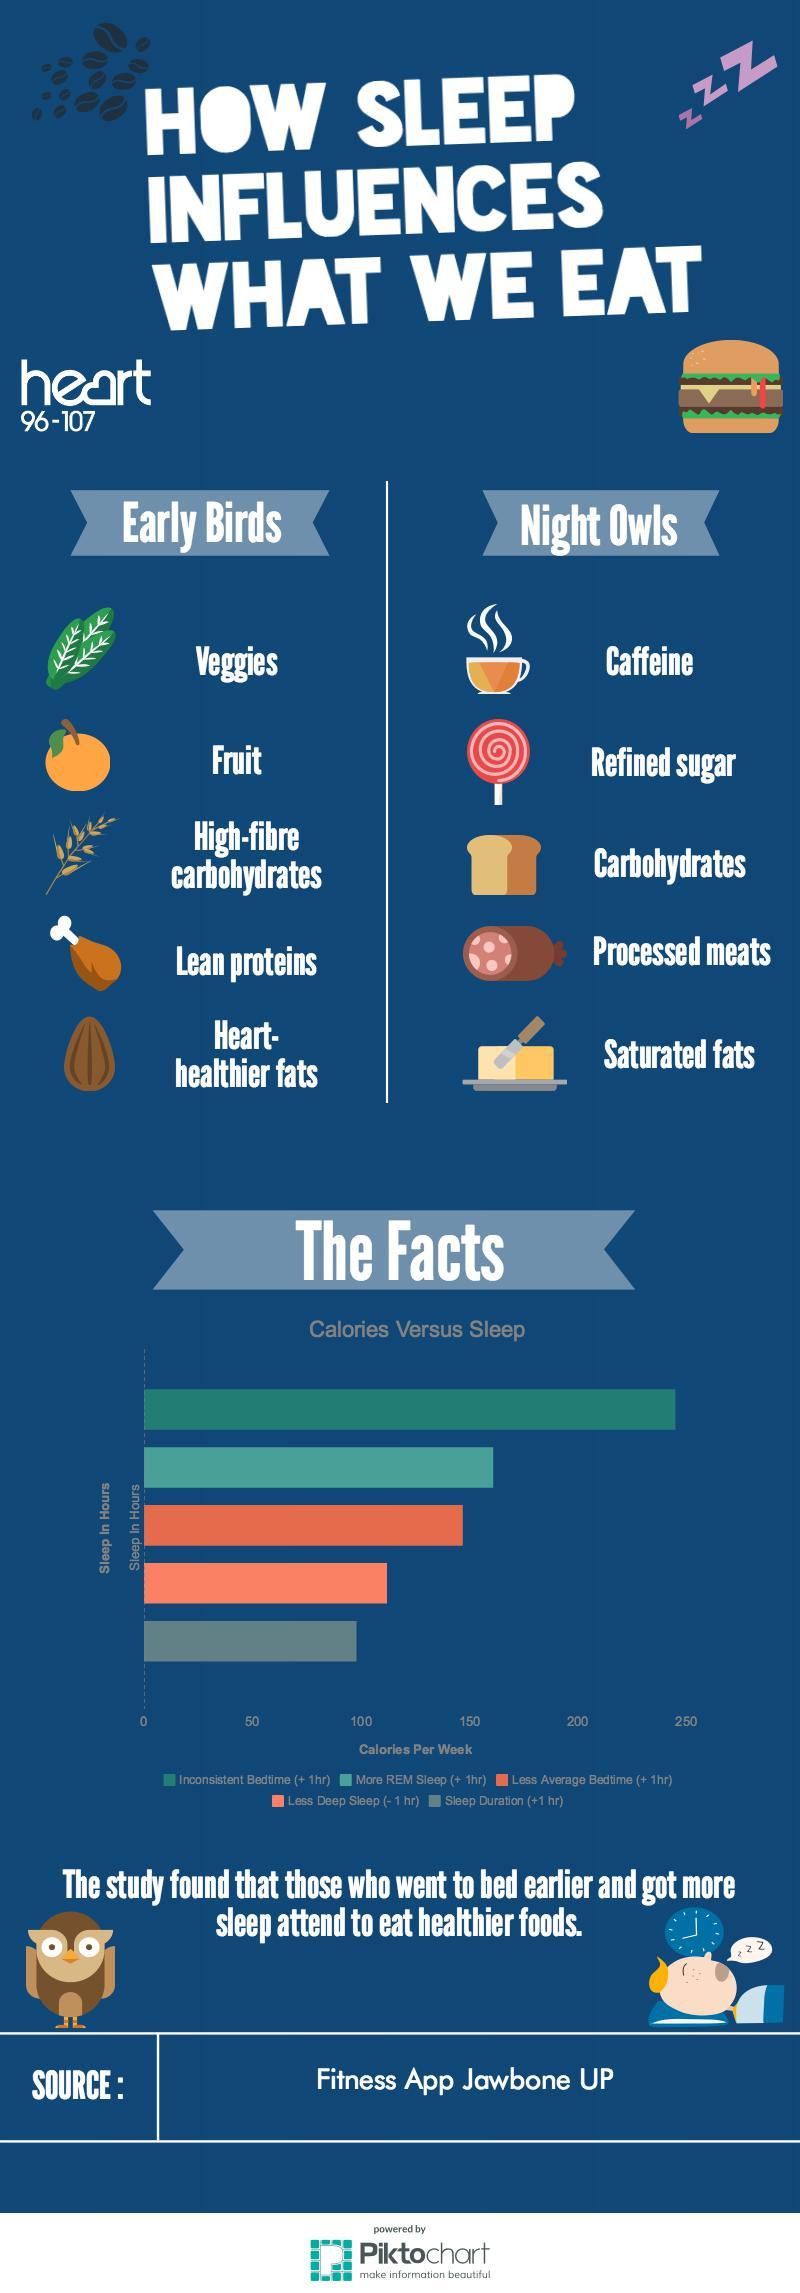 How sleep influences what we eat